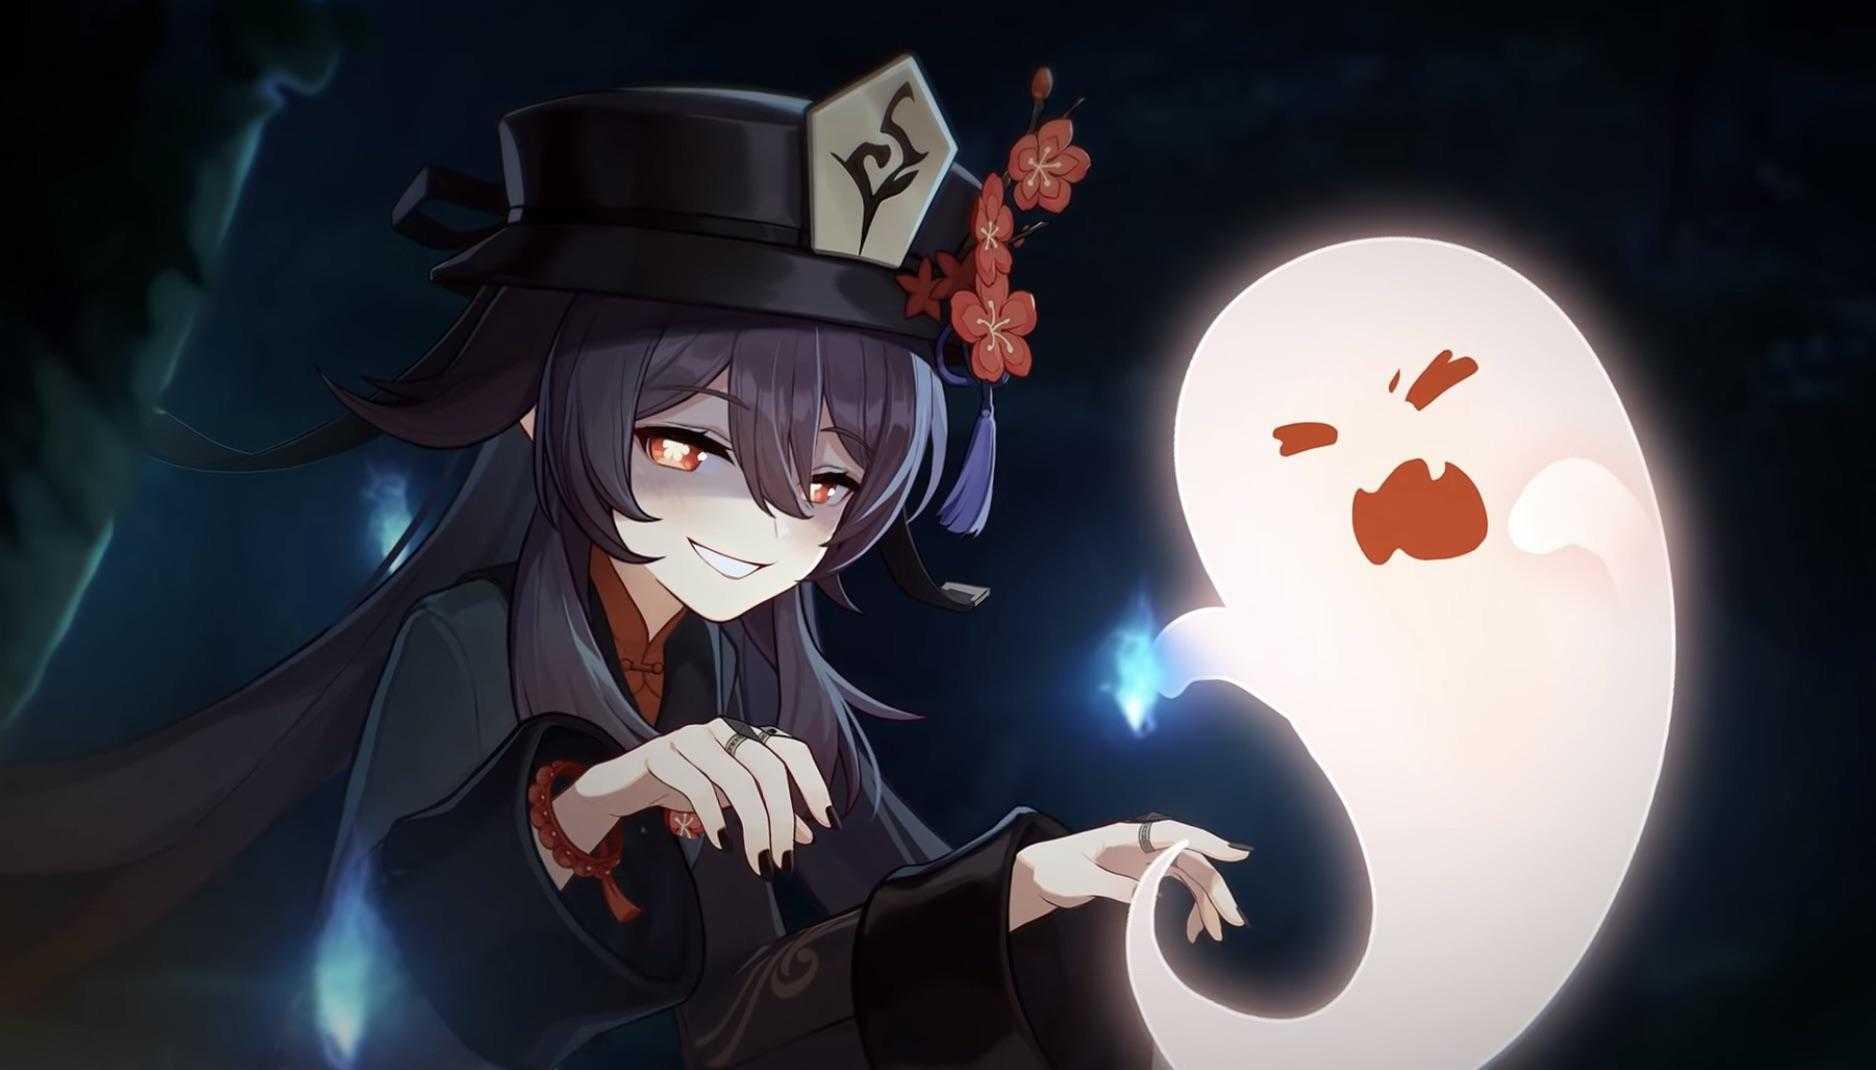 Genshin Impact Hu Tao with Ghost